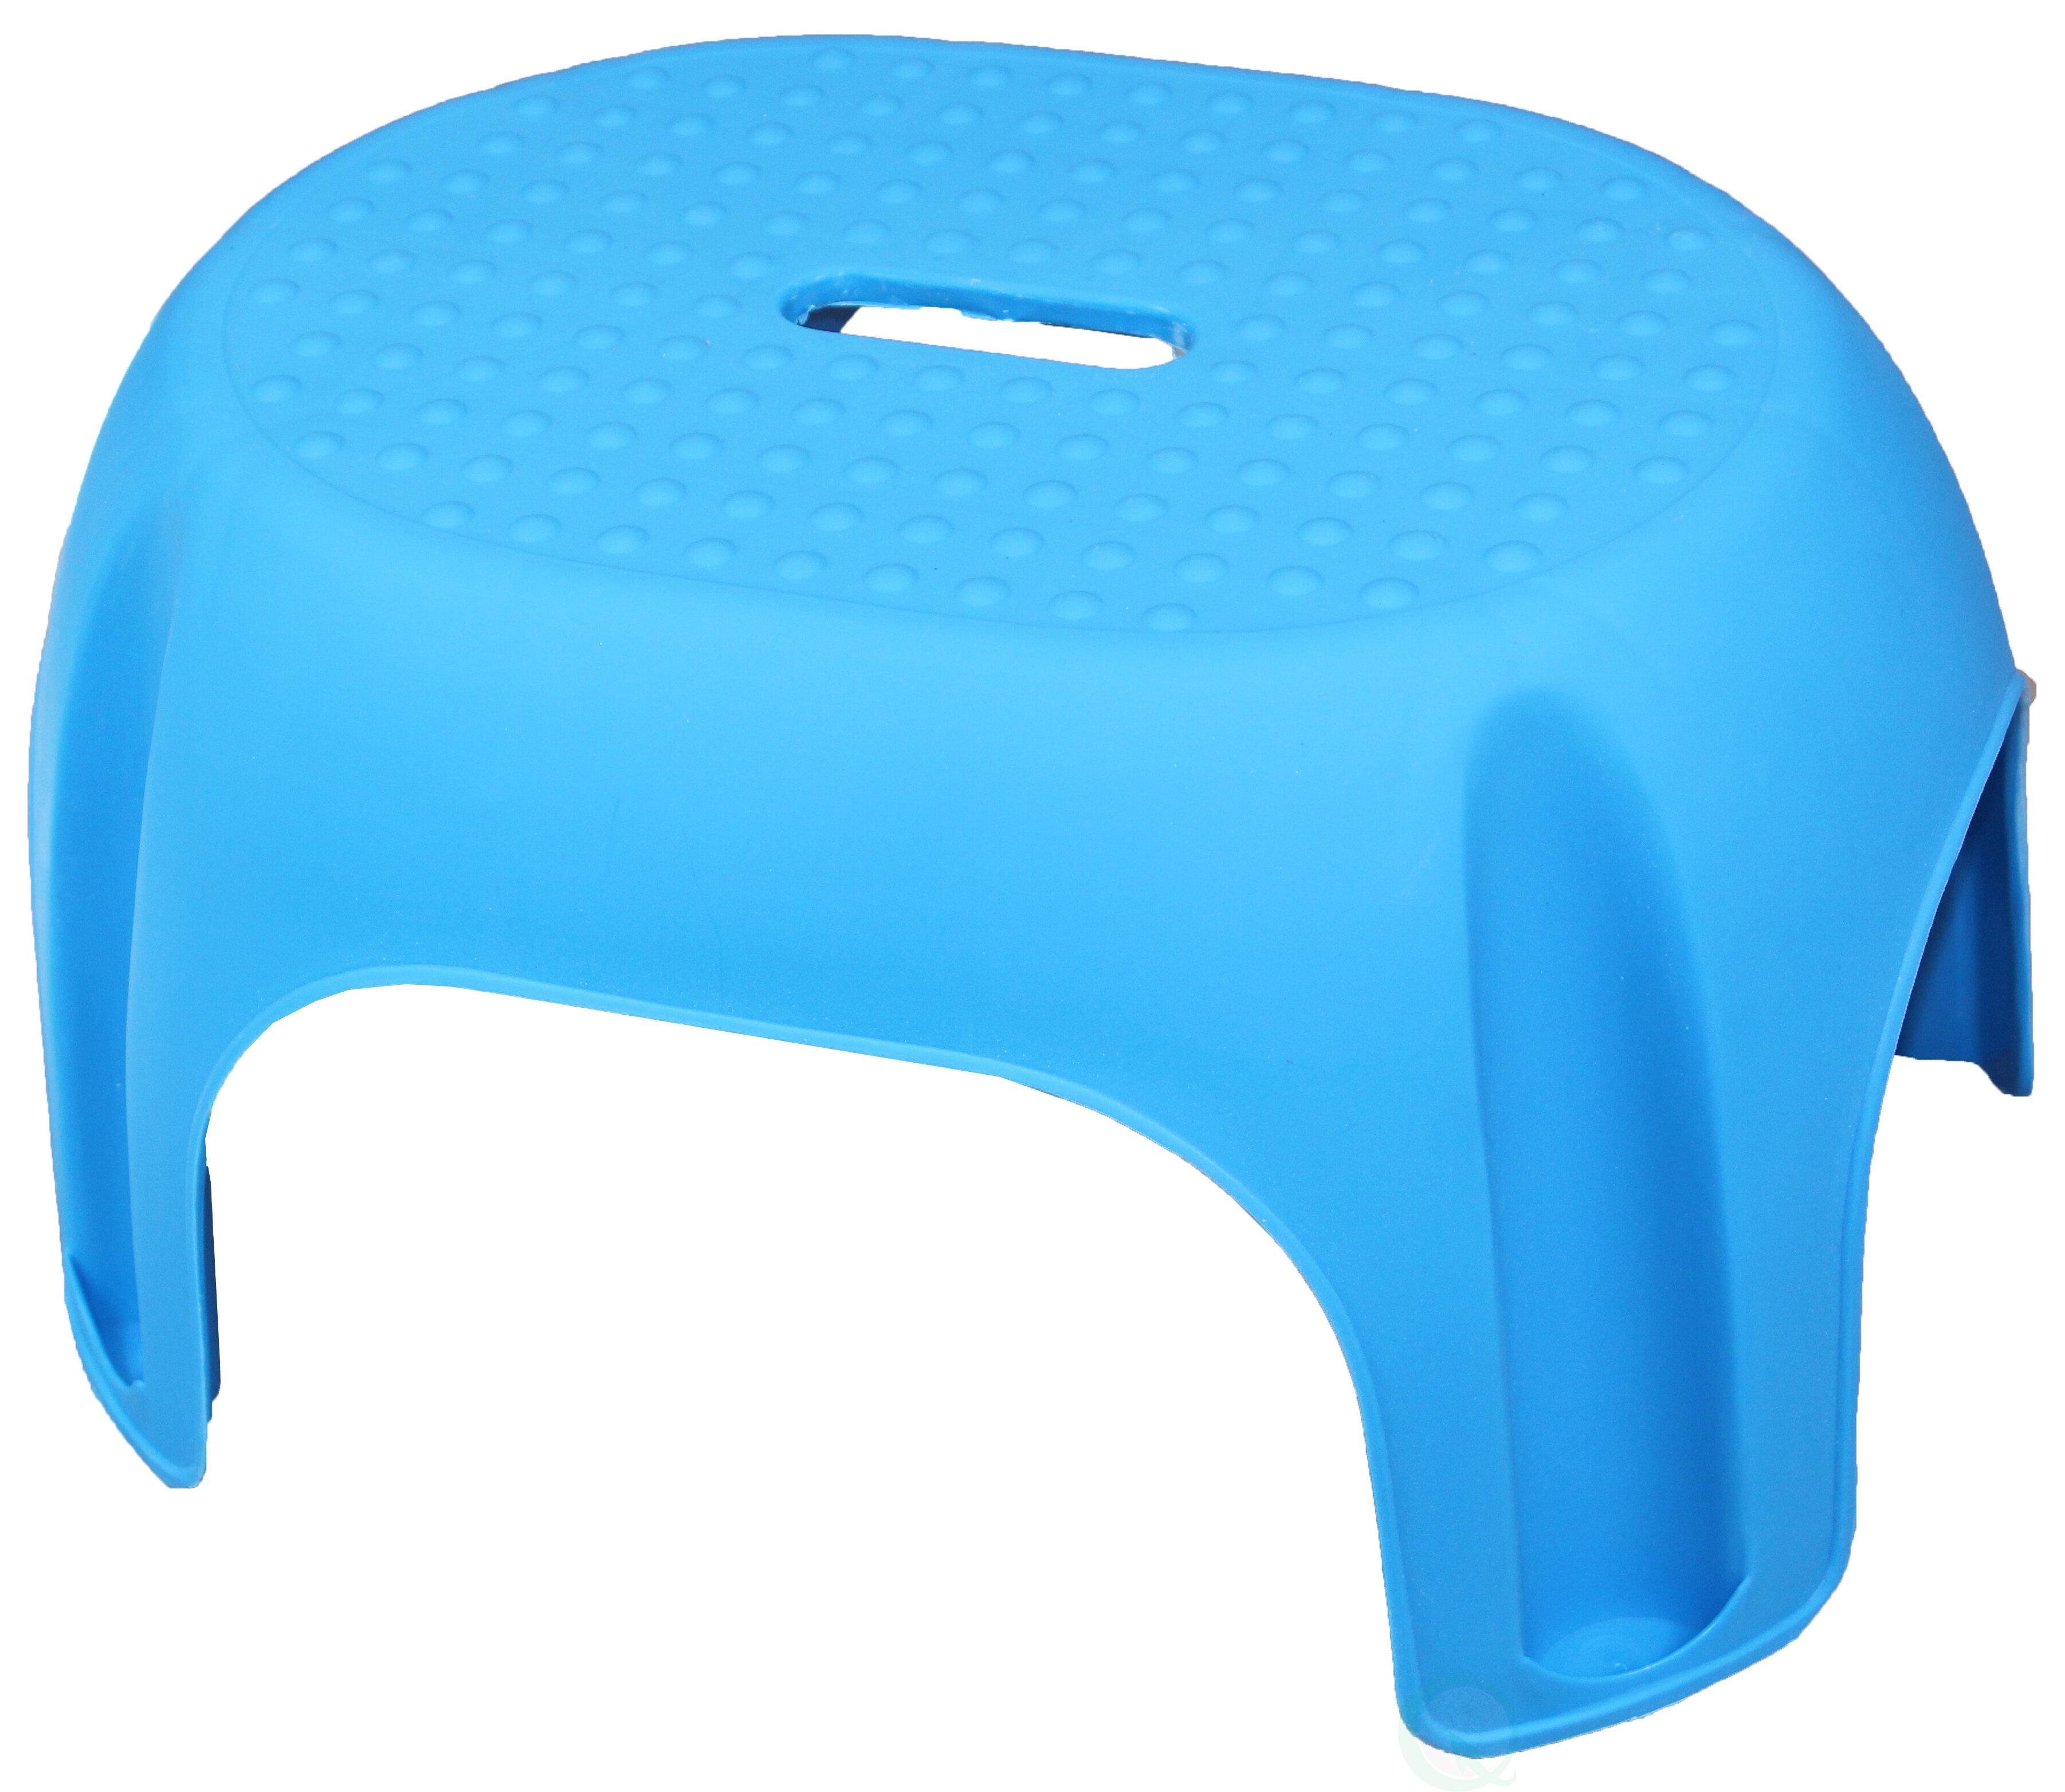 Basicwise Plastic Step Stool | Wayfair